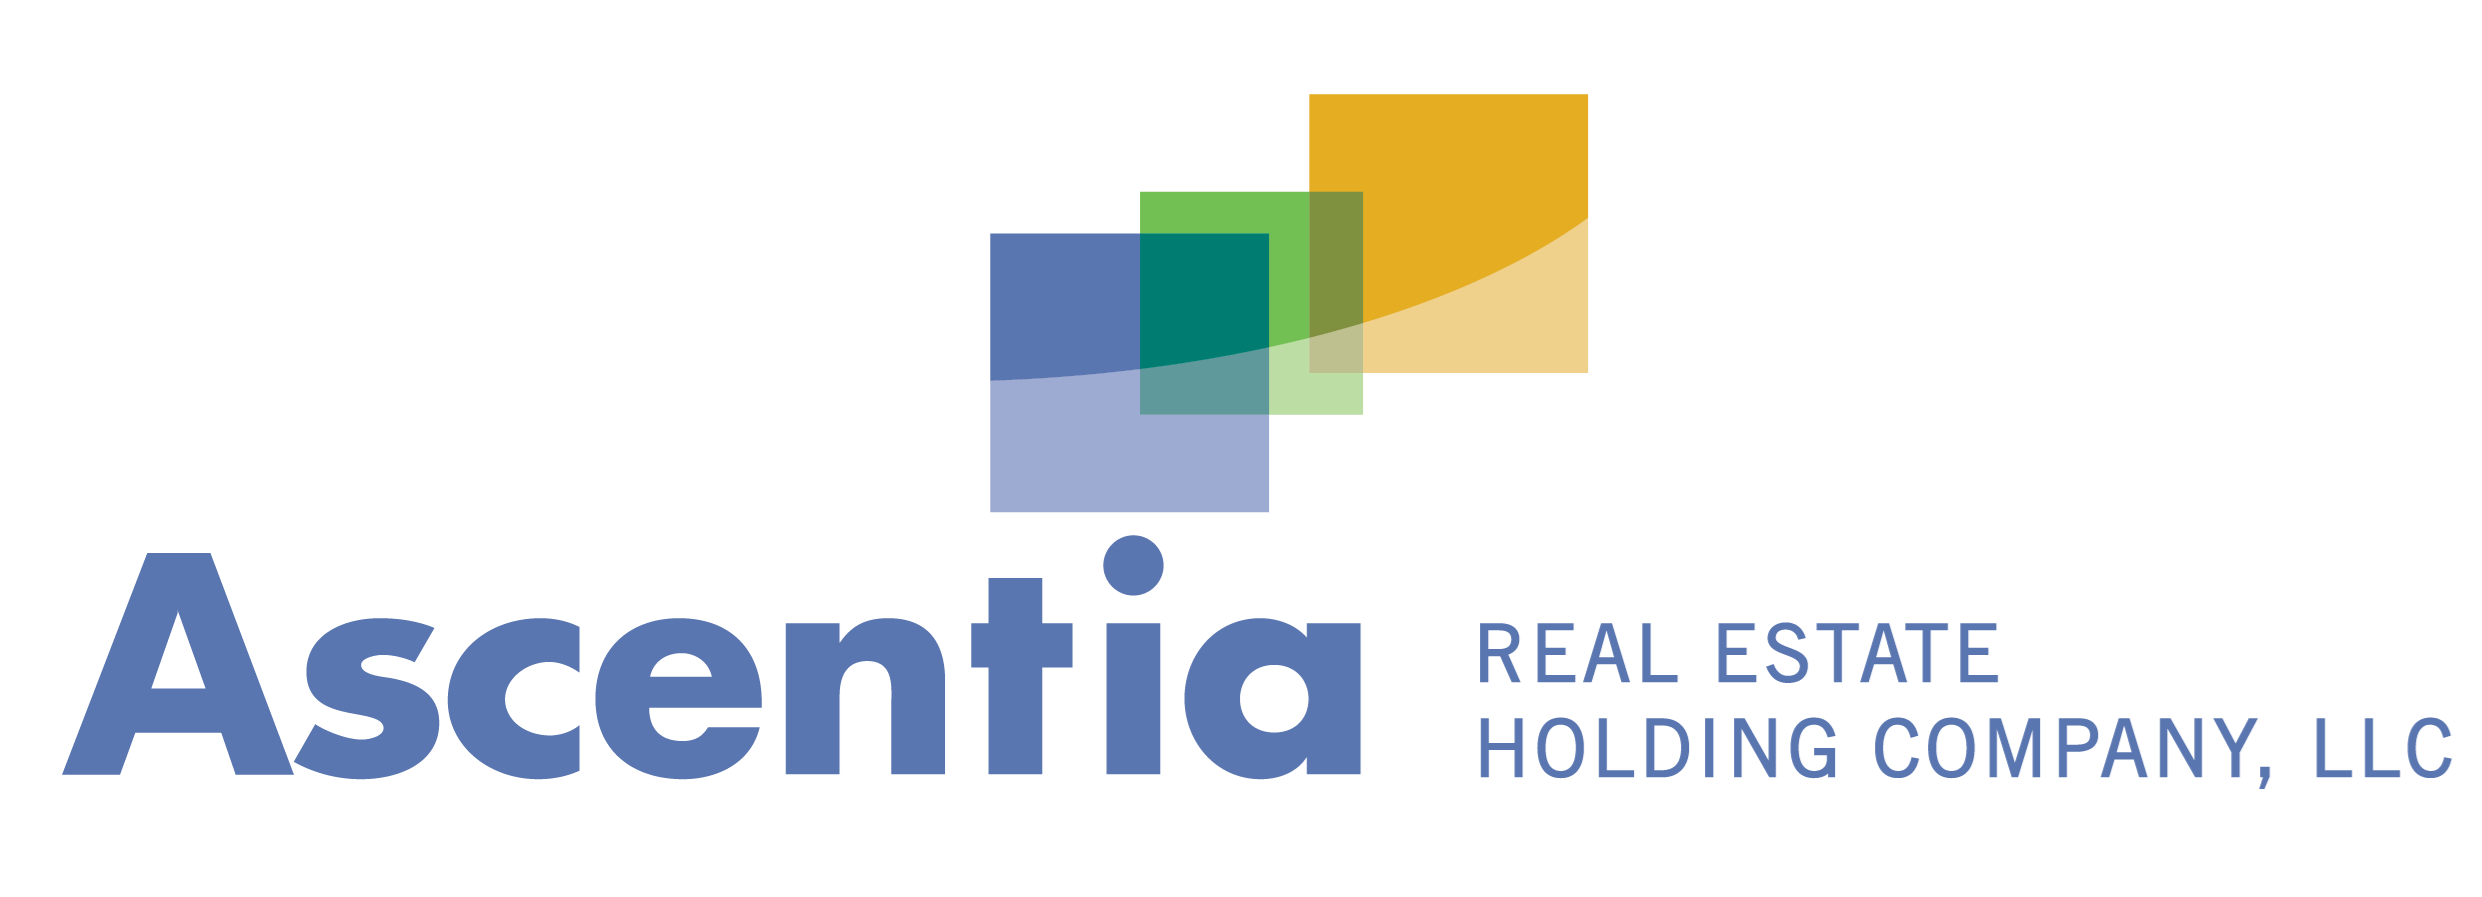 New Braunfels Property Logo 4